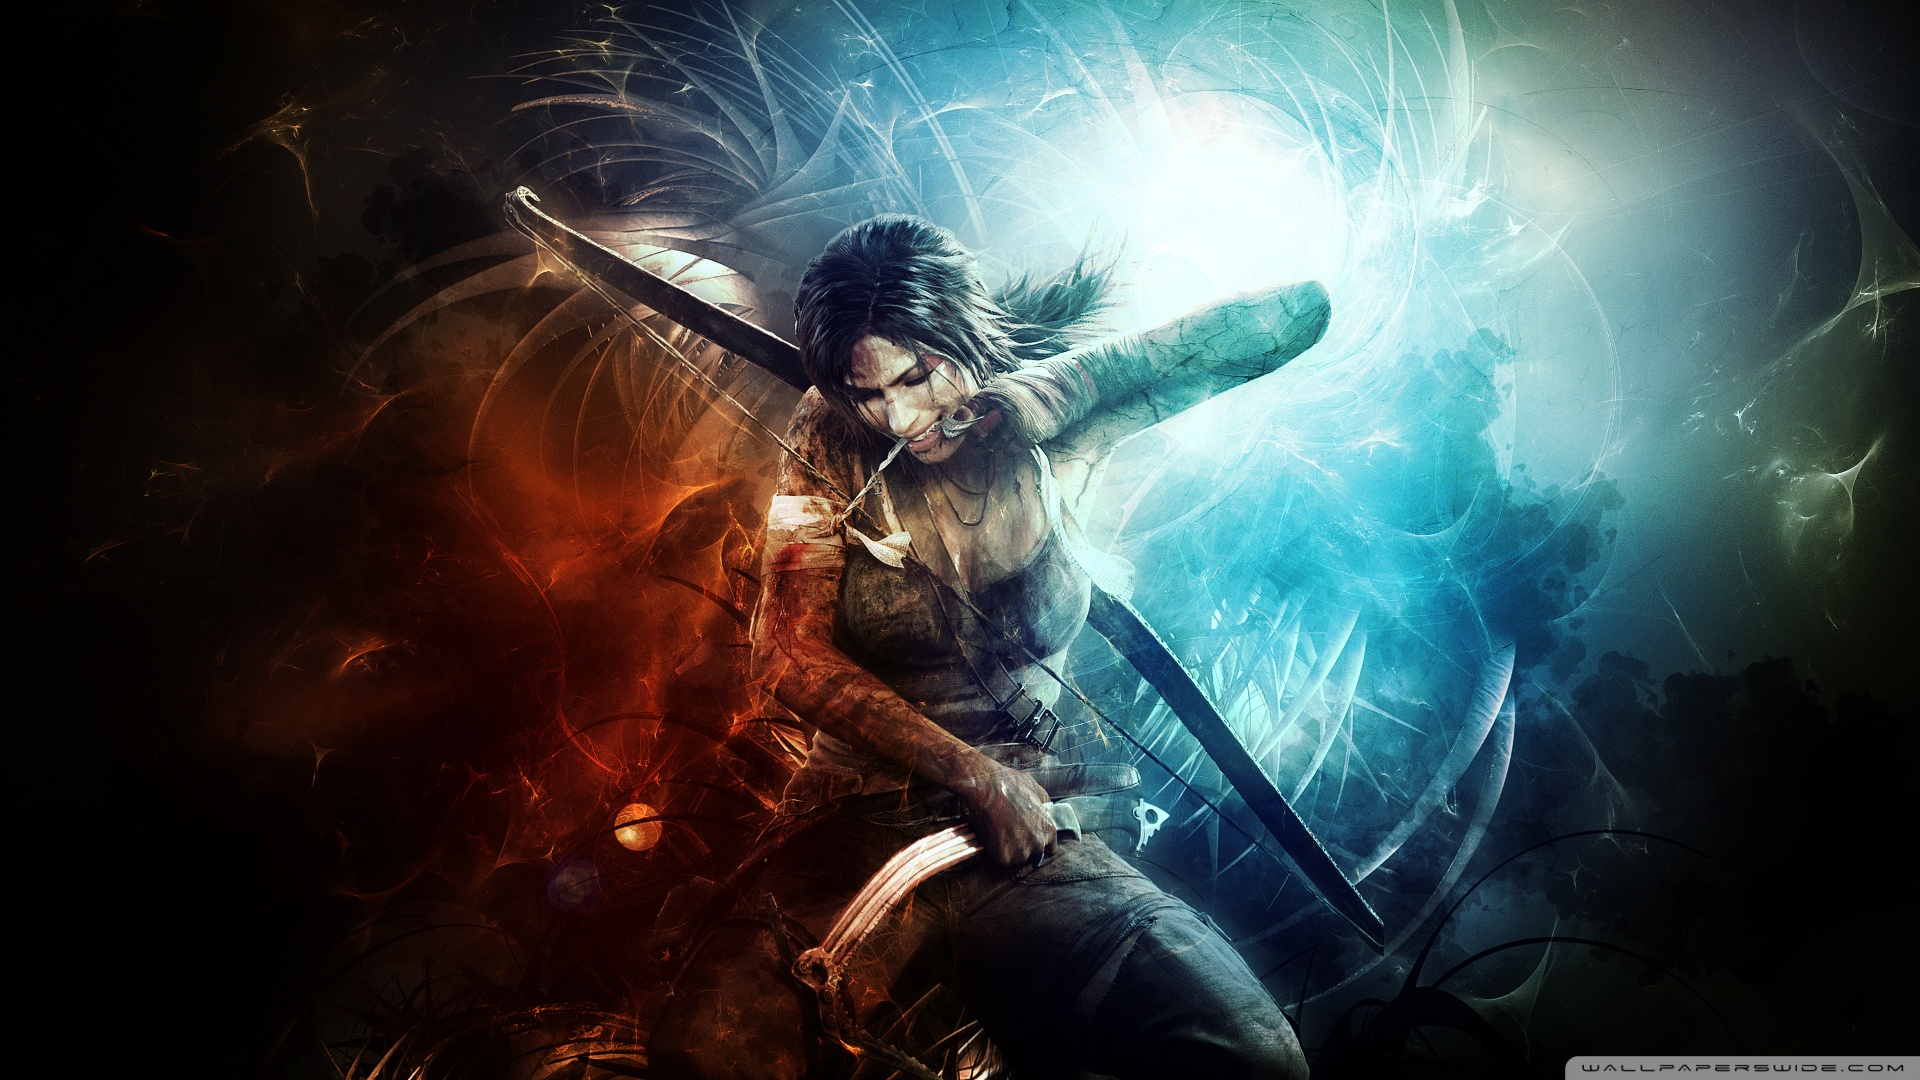 Lara-Croft-is-Beautiful-wallpaper-wpc5806671